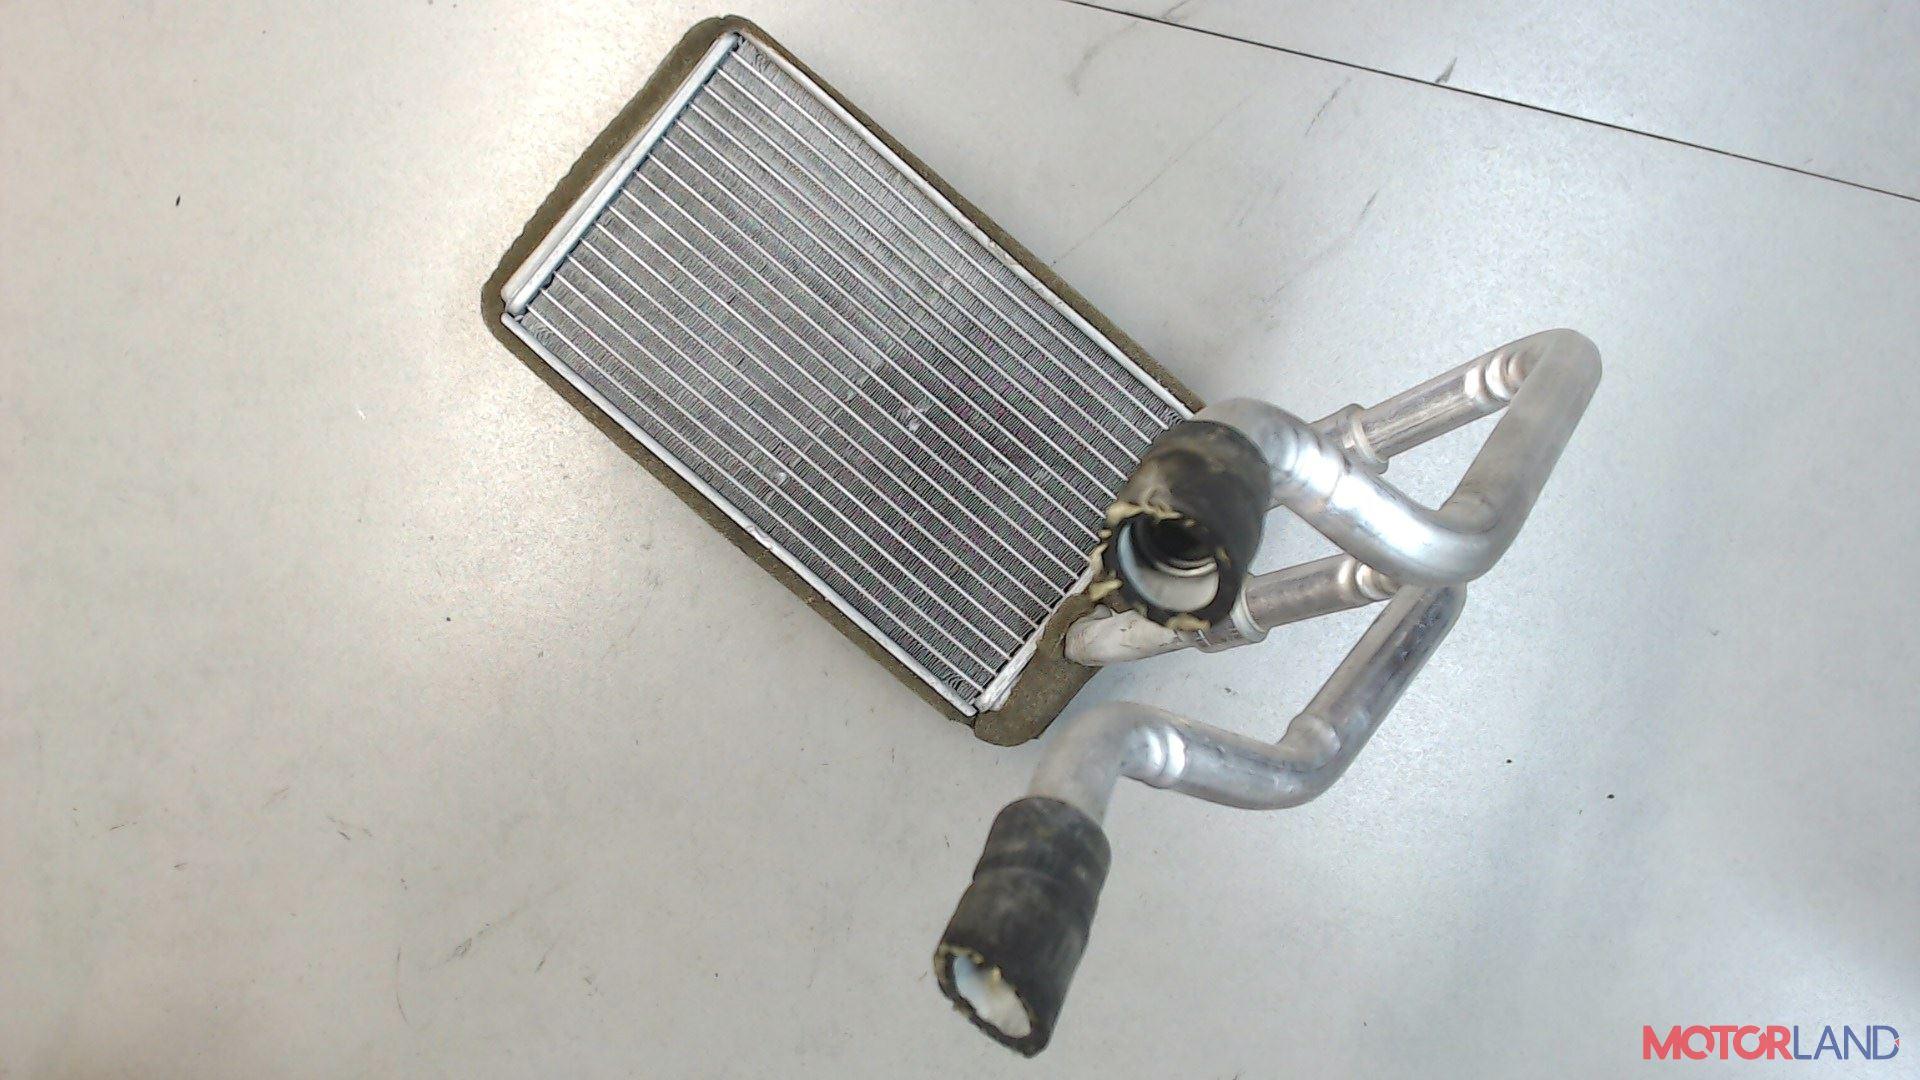 Радиатор отопителя (печки) Infiniti QX56 (JA60) 2004-2010, [КонстрНомер-Артикул] #1